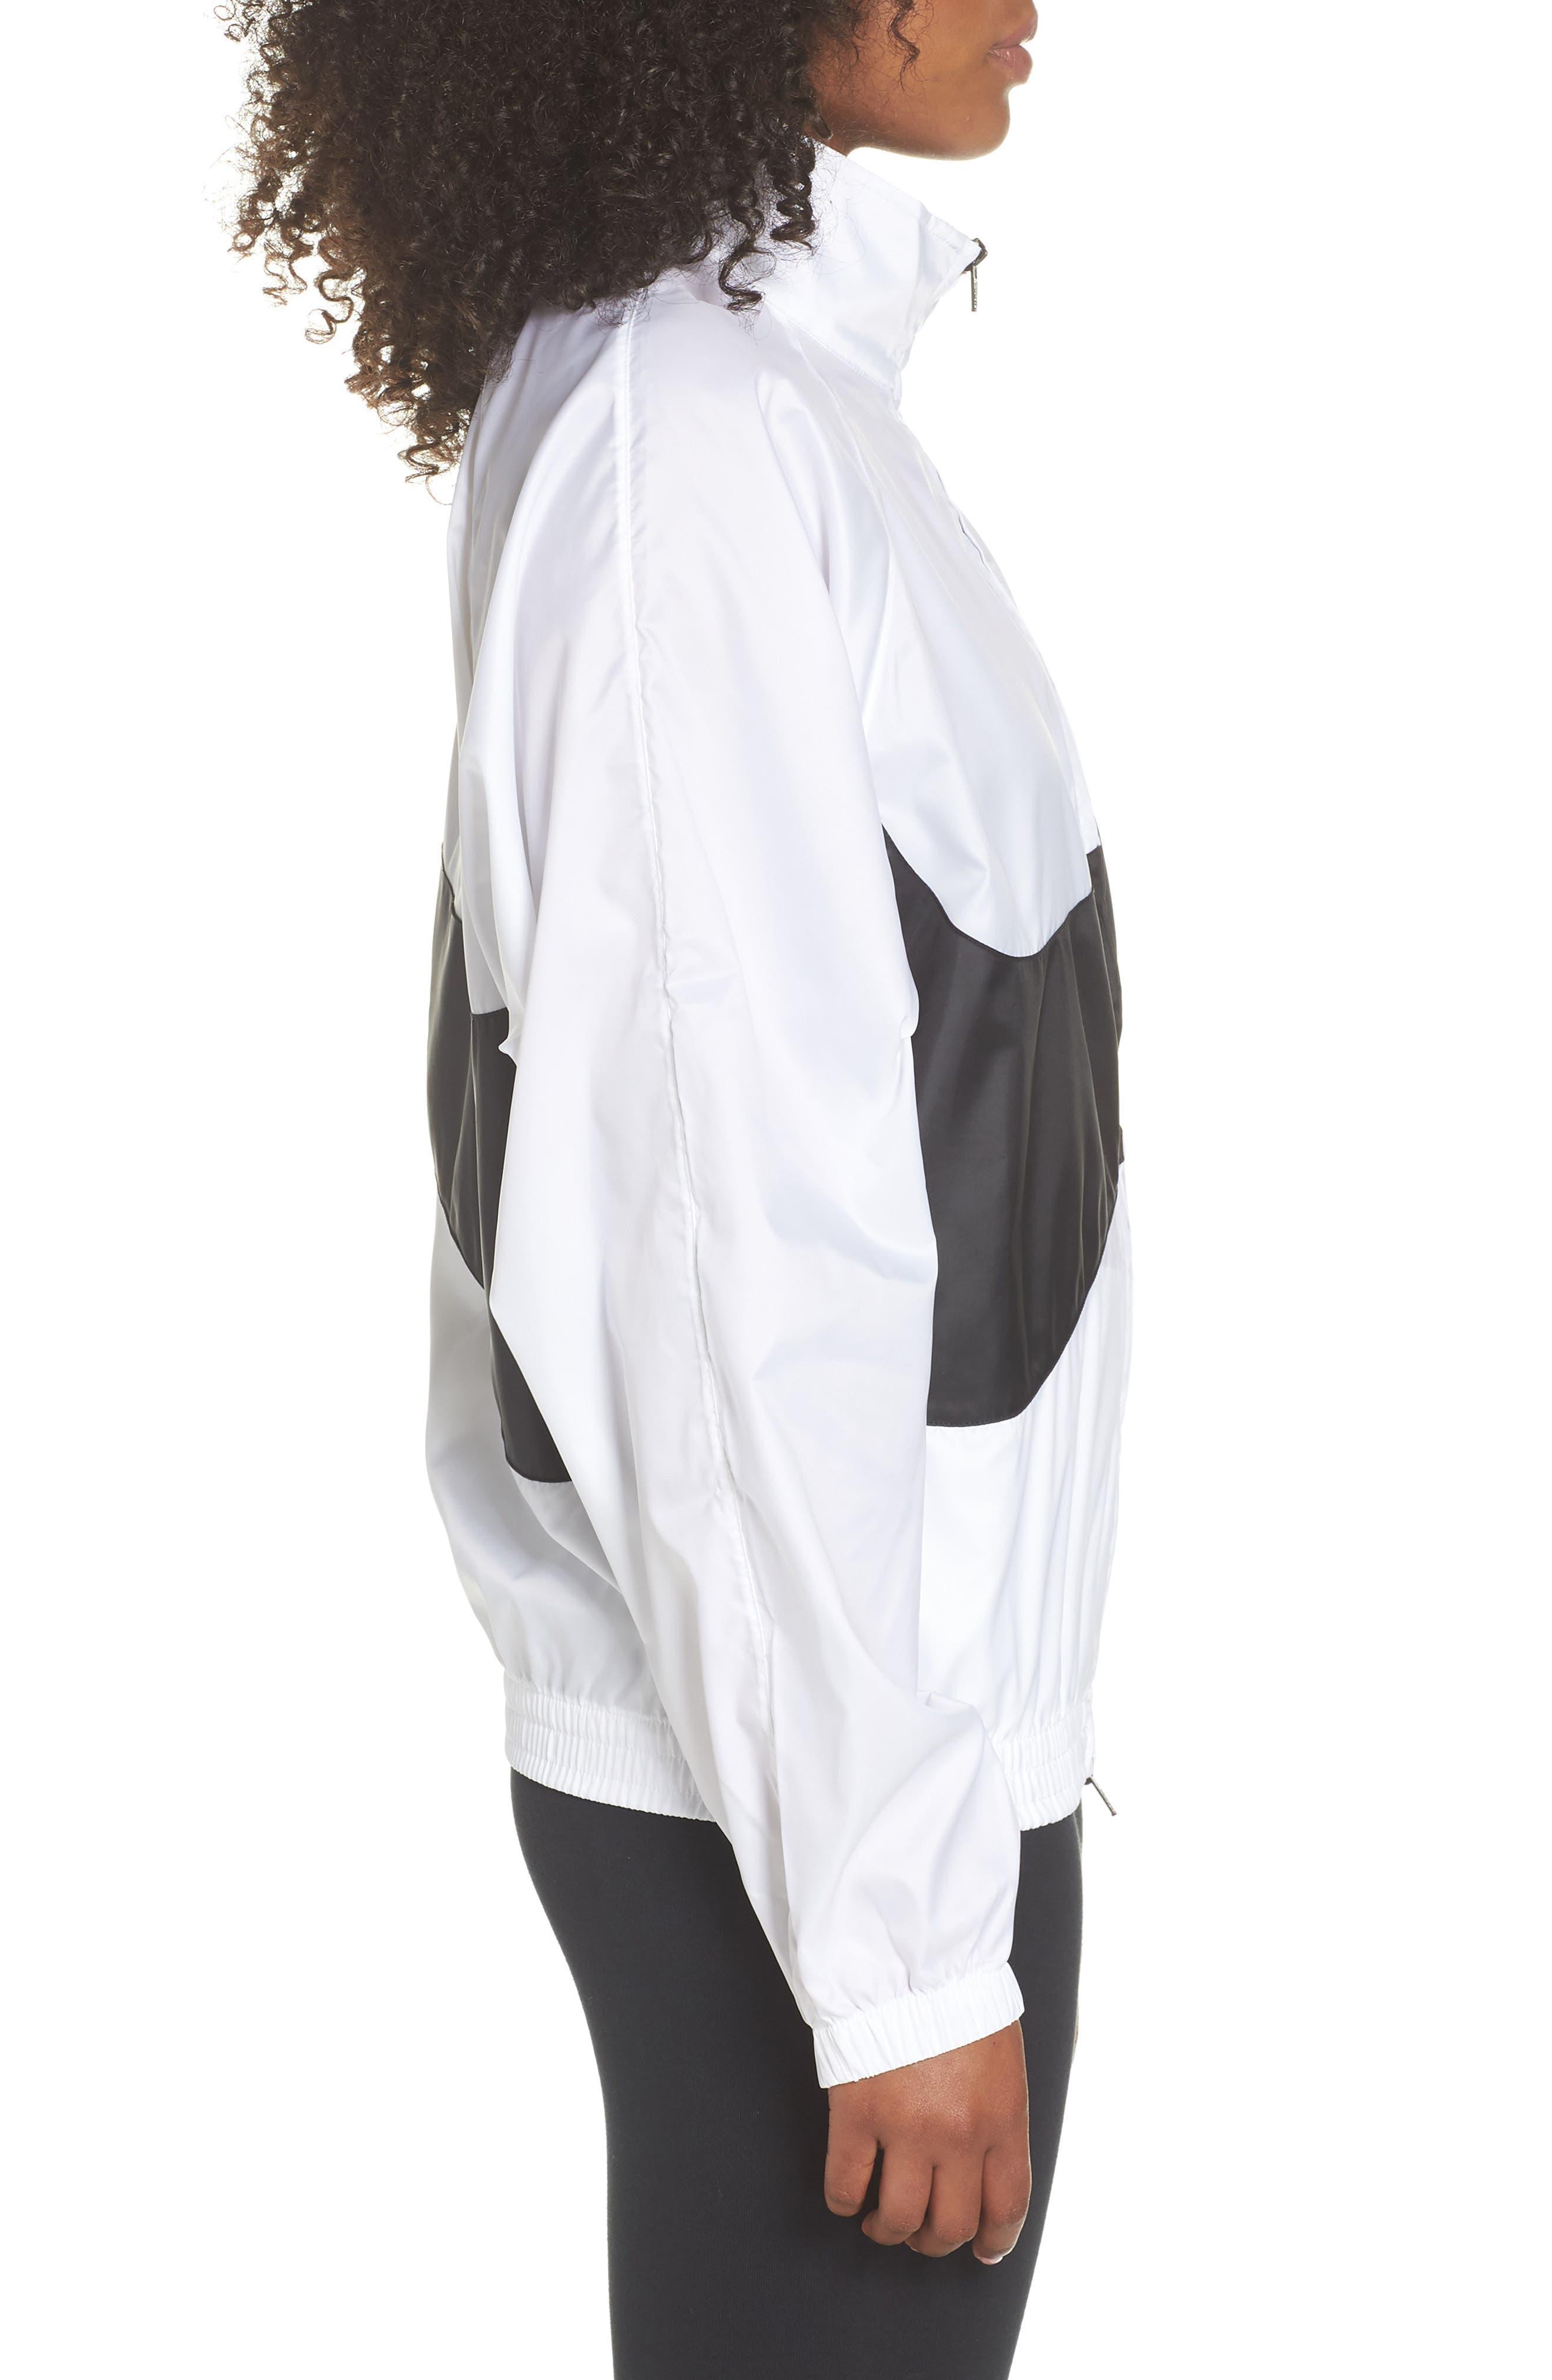 NikeLab Collection Unisex Heritage Jacket,                             Alternate thumbnail 3, color,                             100